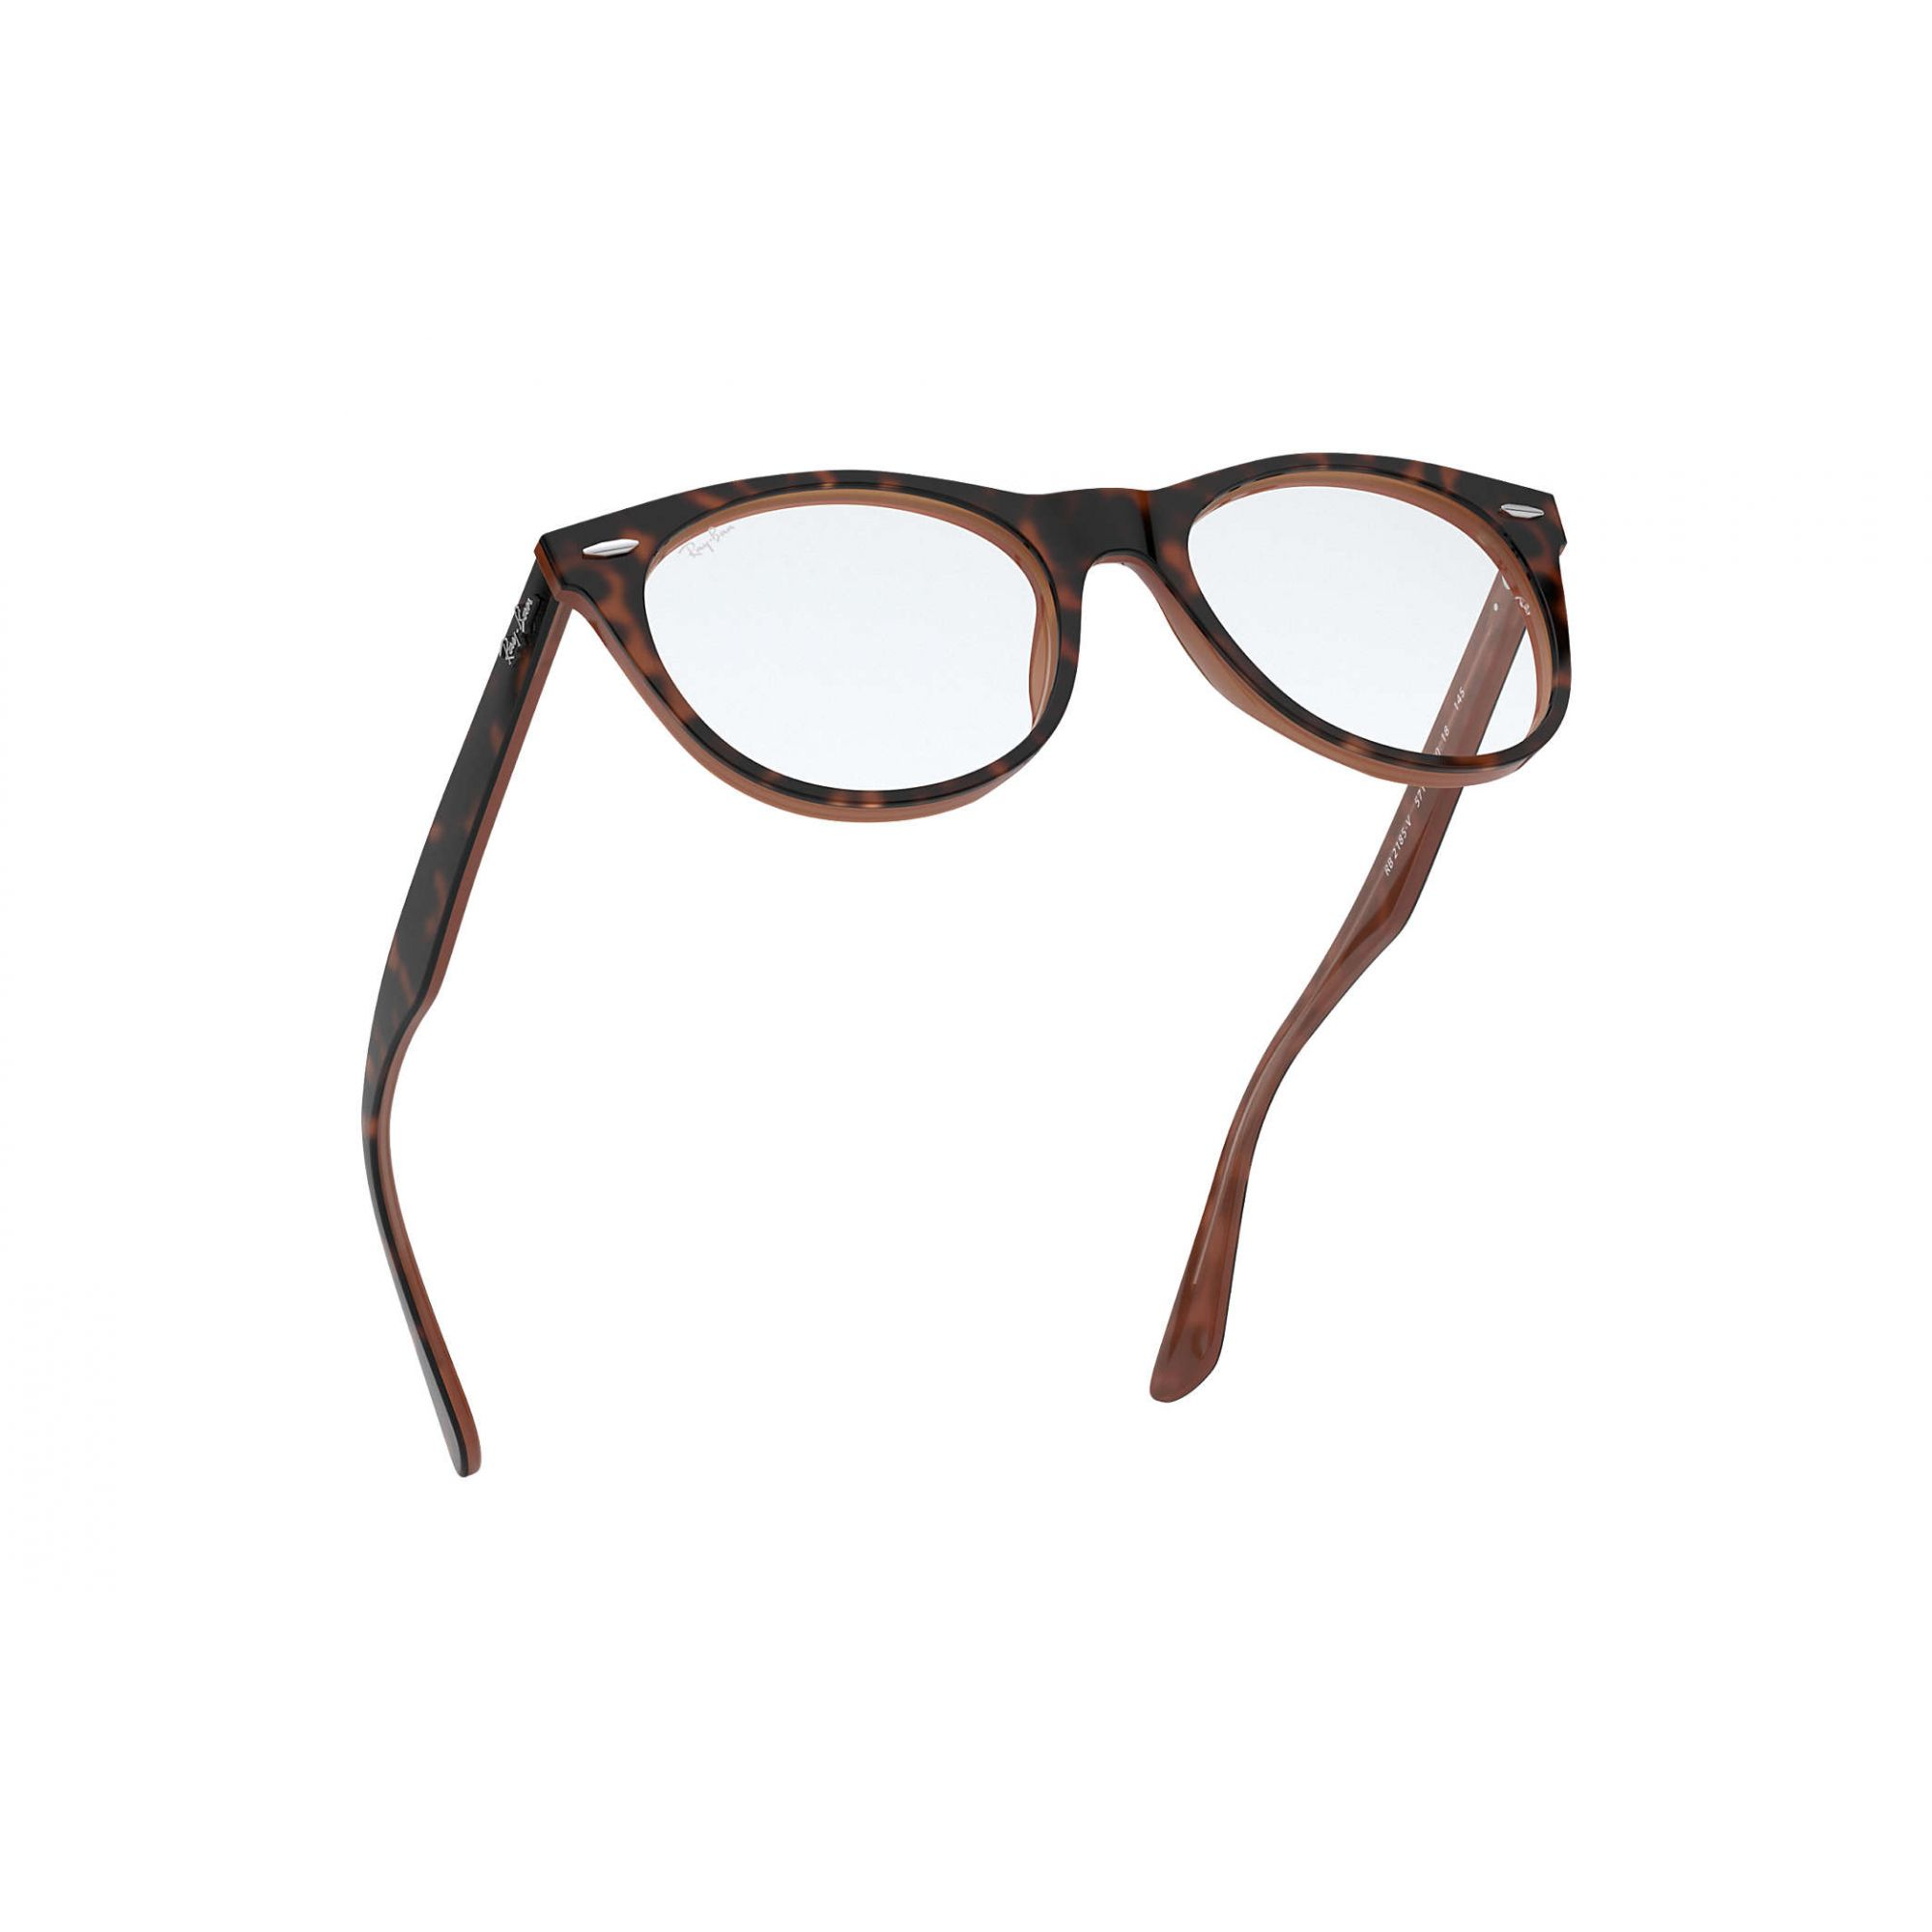 Ray Ban - RB2185V 5713 - Óculos de grau